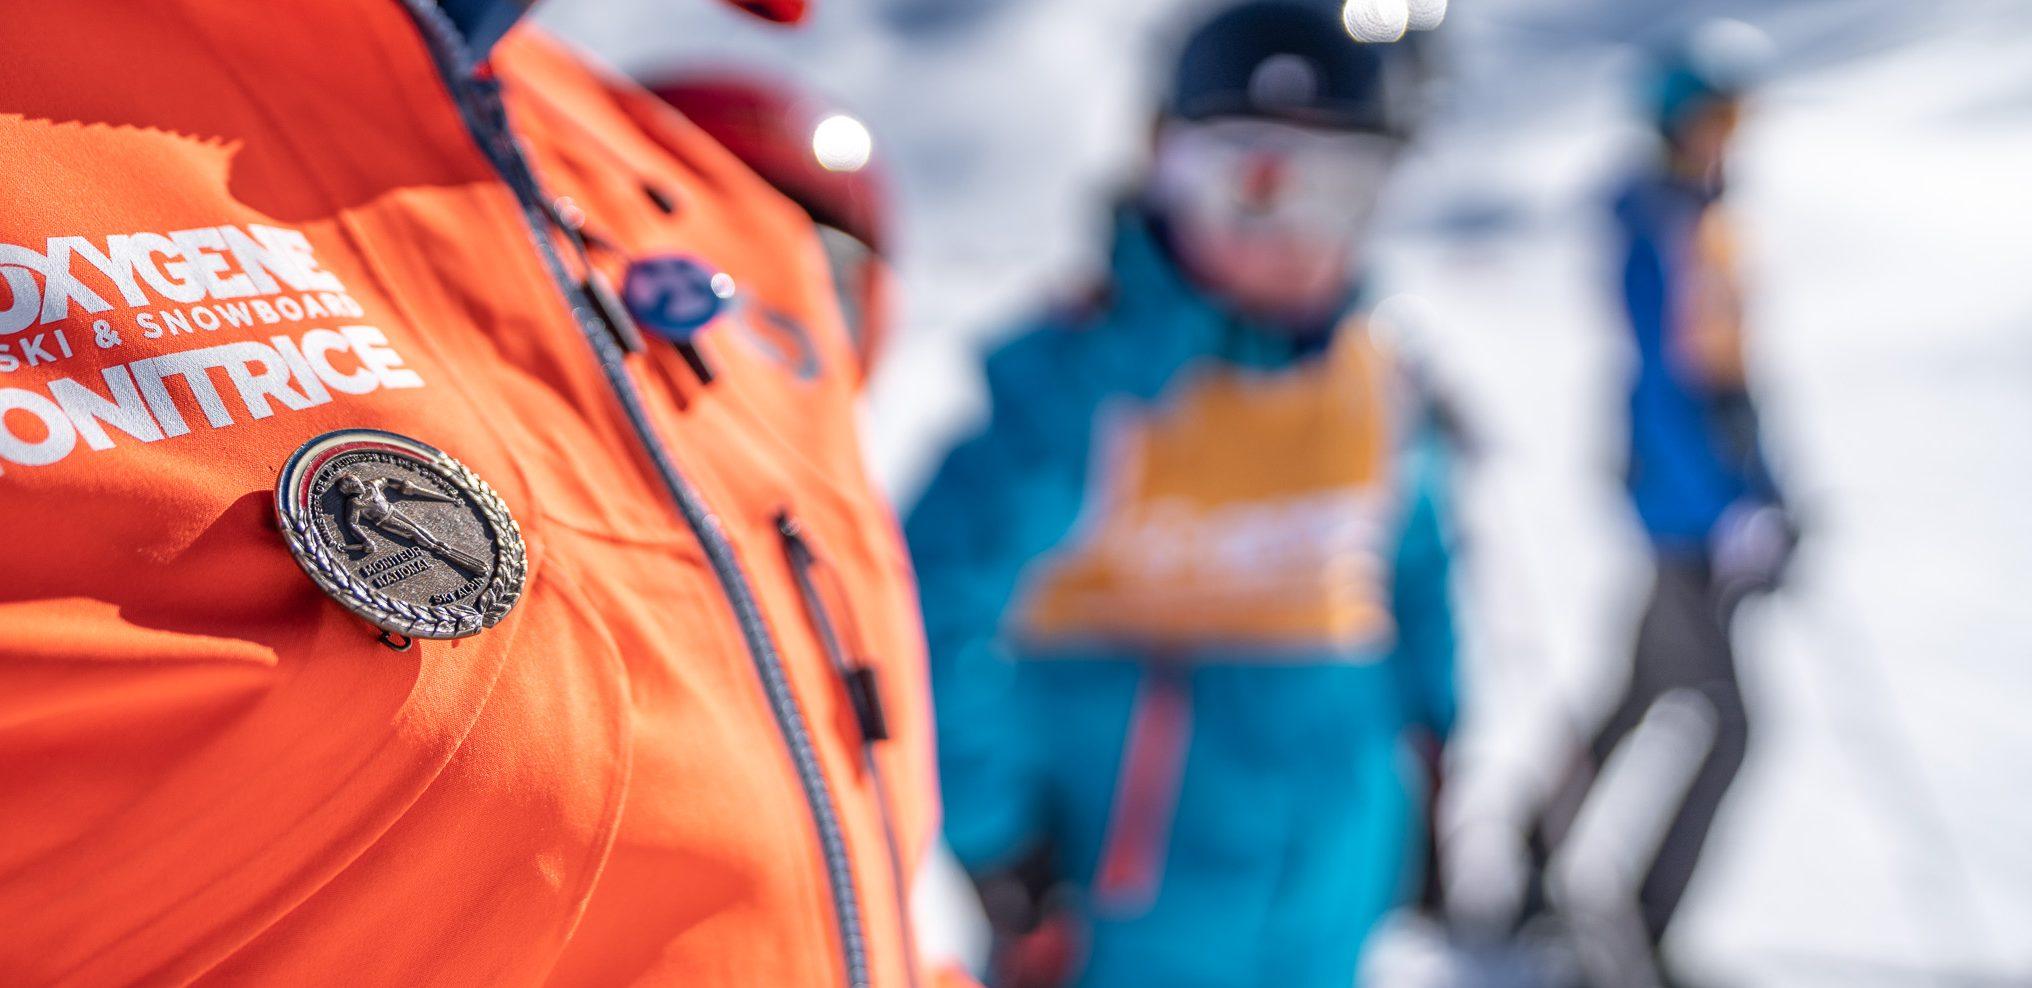 French diploma ski instructor medal